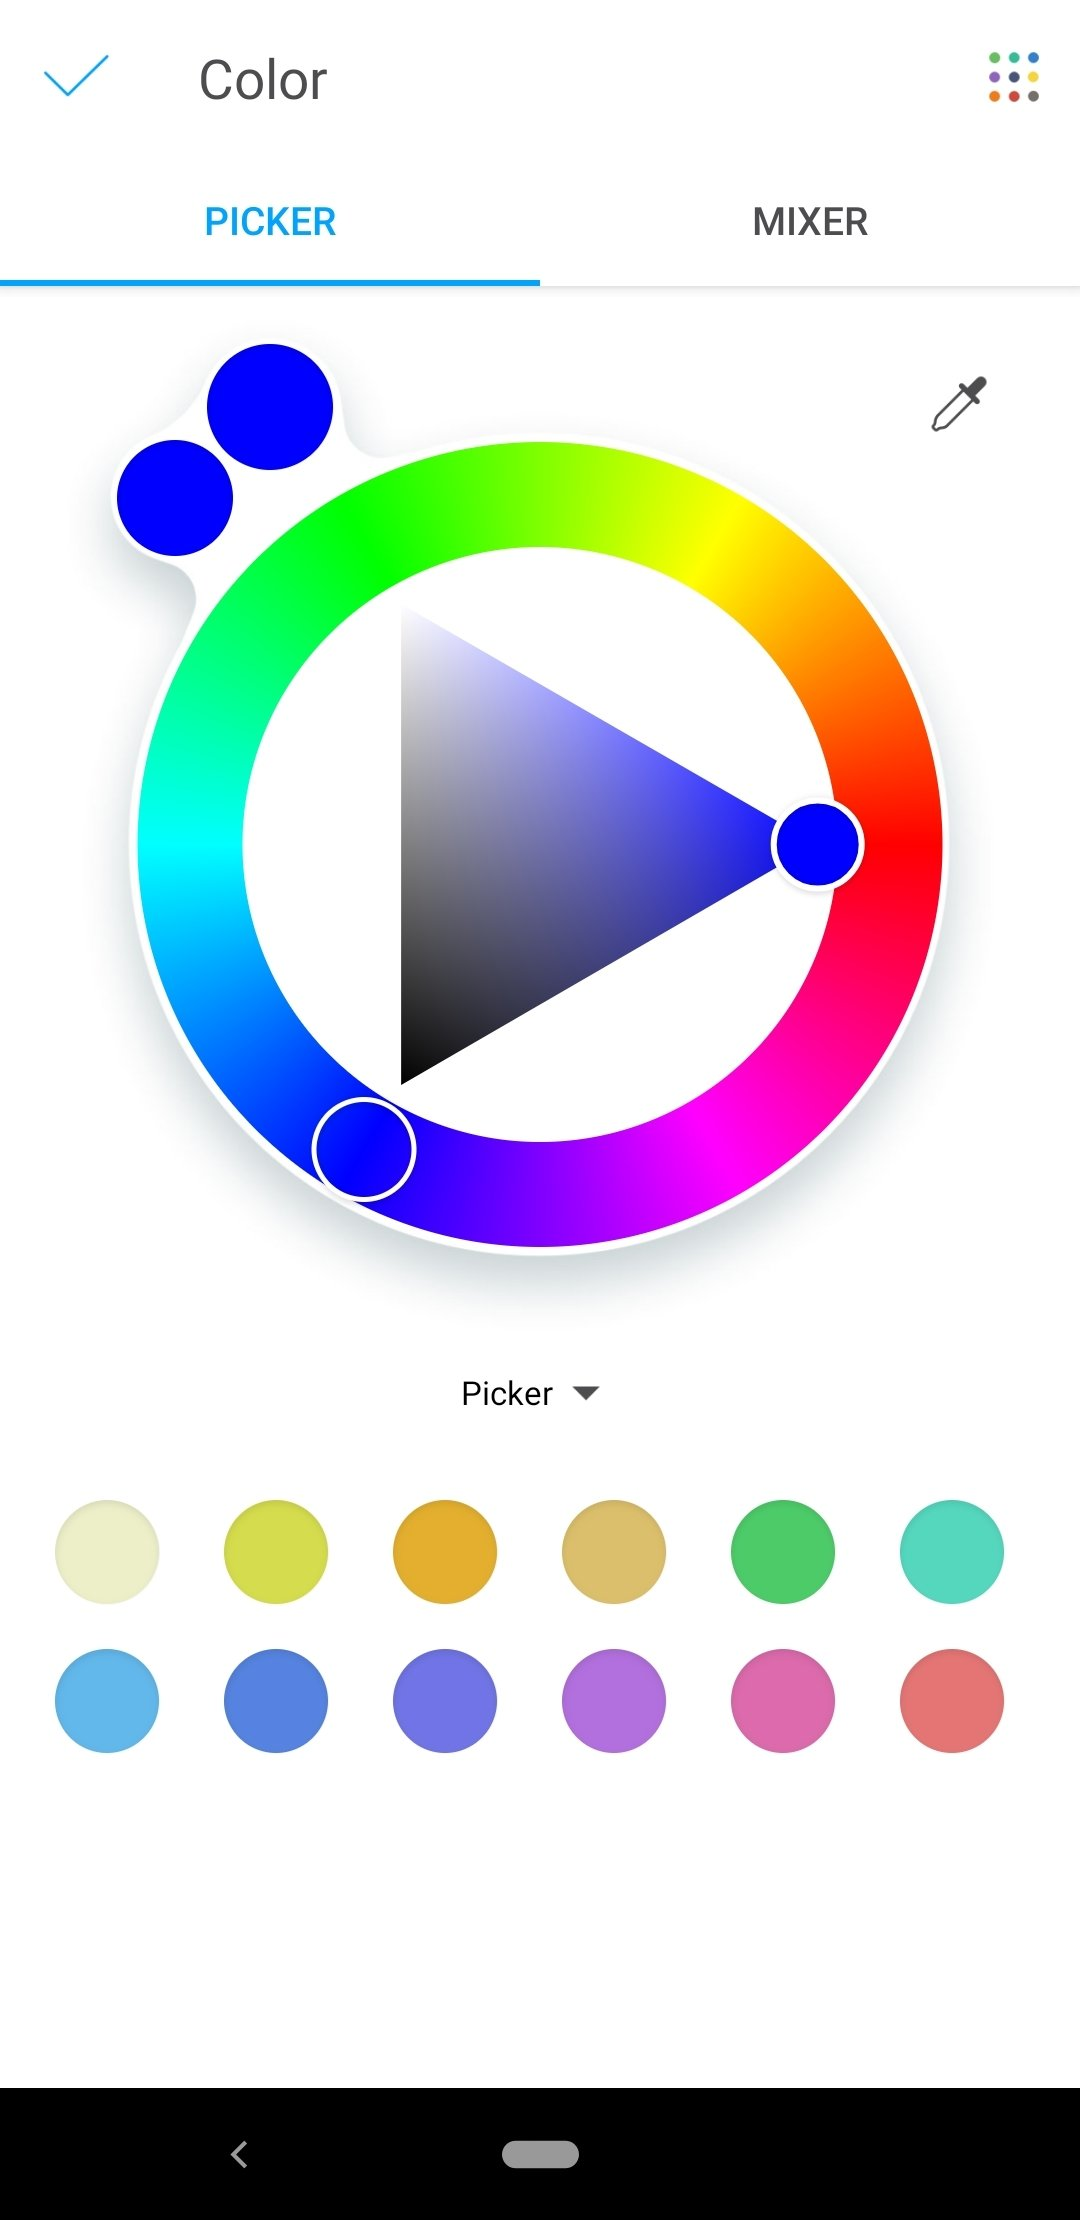 hight resolution of picsart color pintar imagen 1 thumbnail picsart color pintar imagen 2 thumbnail